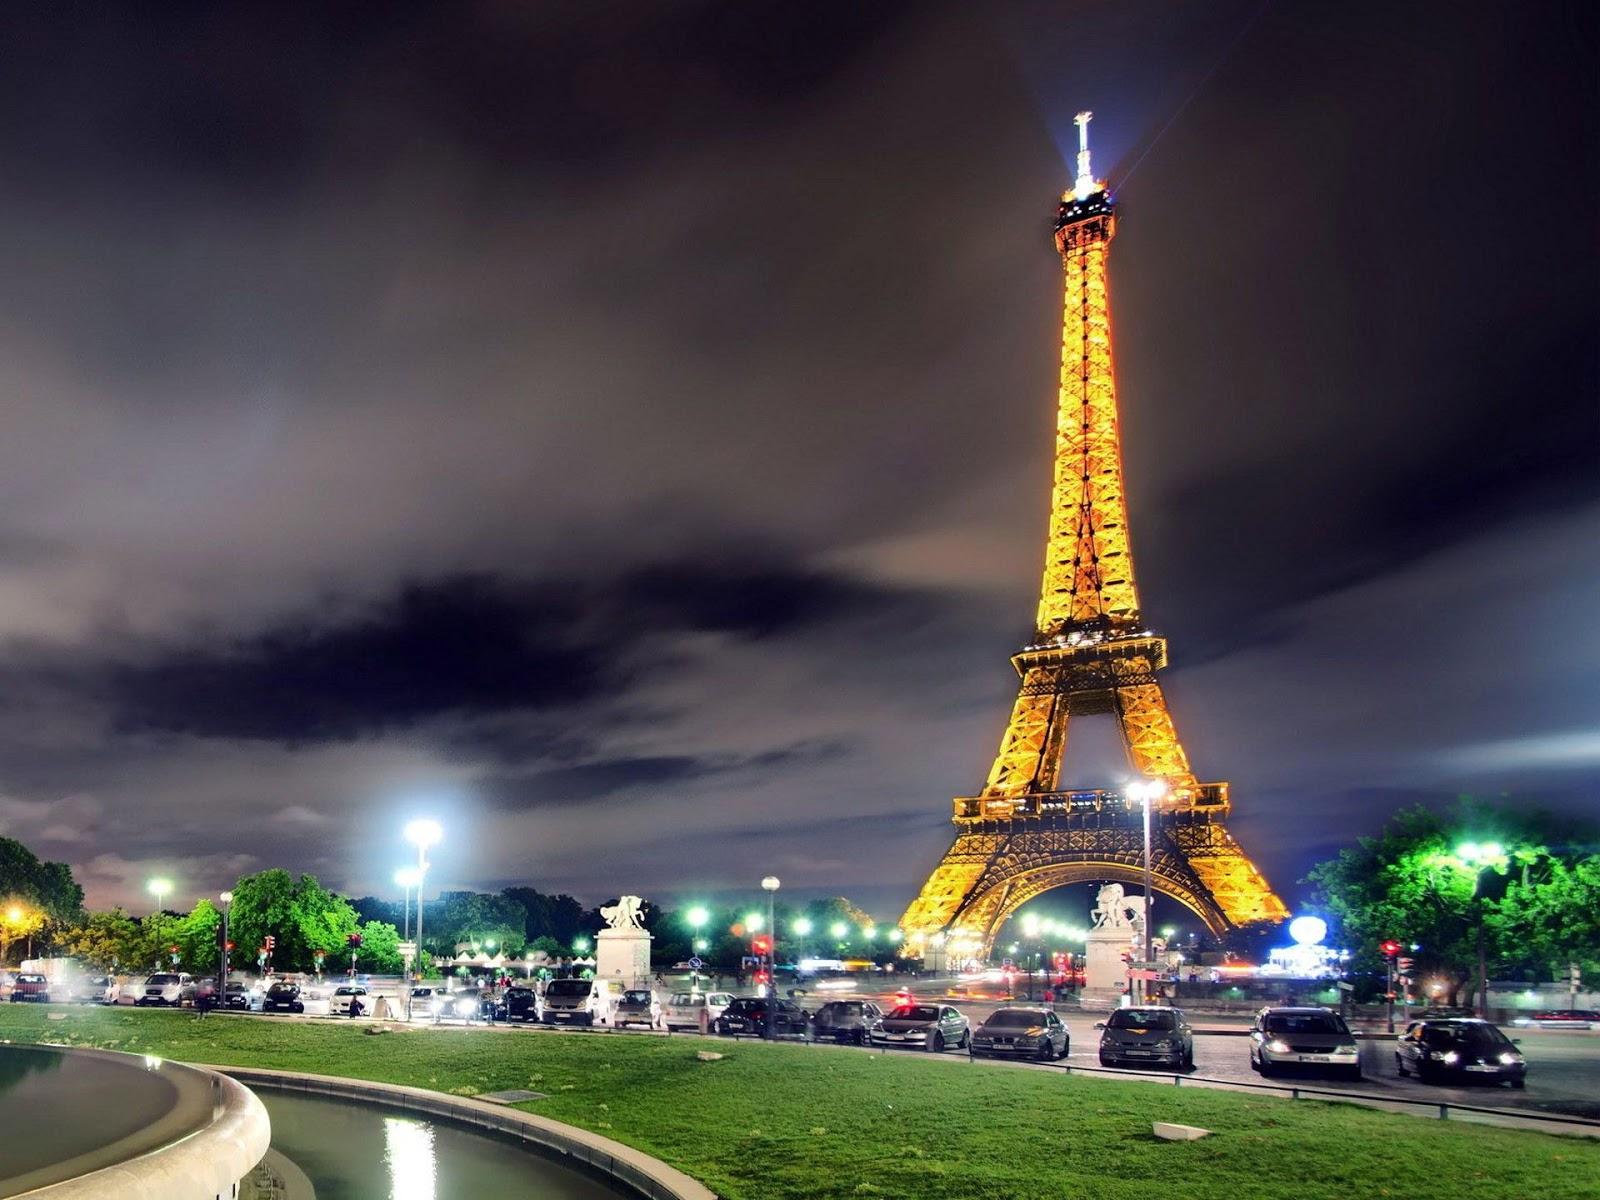 Paris: Paris City at Night